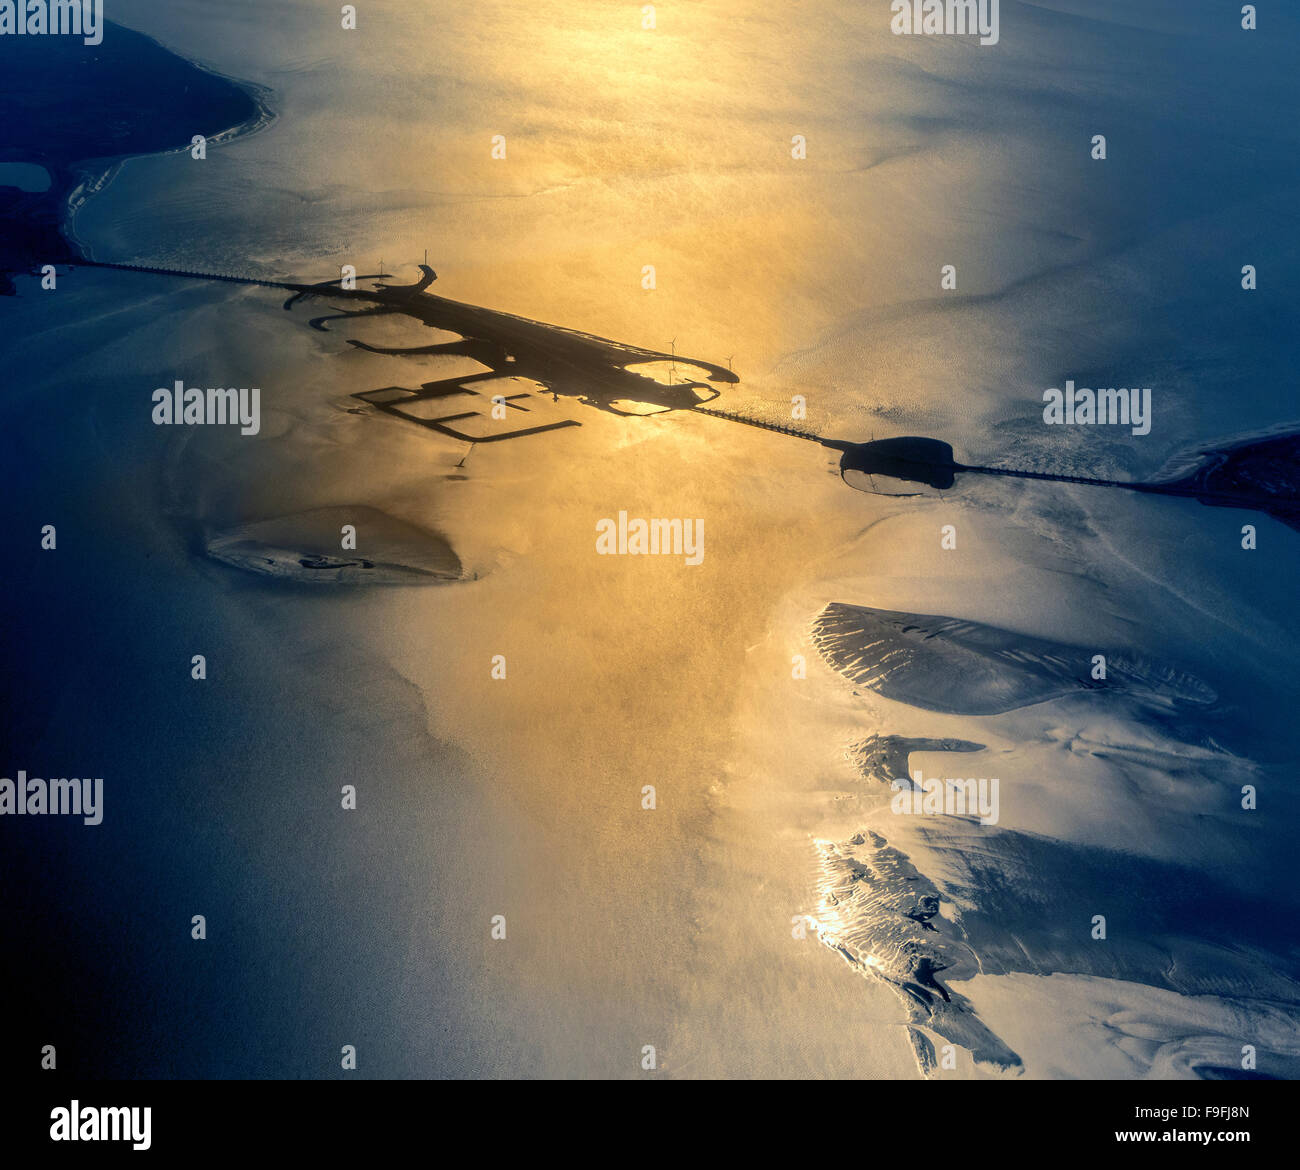 https://c7.alamy.com/comp/F9FJ8N/oosterschelde-storm-surge-or-flood-barrier-part-of-dutch-delta-works-F9FJ8N.jpg